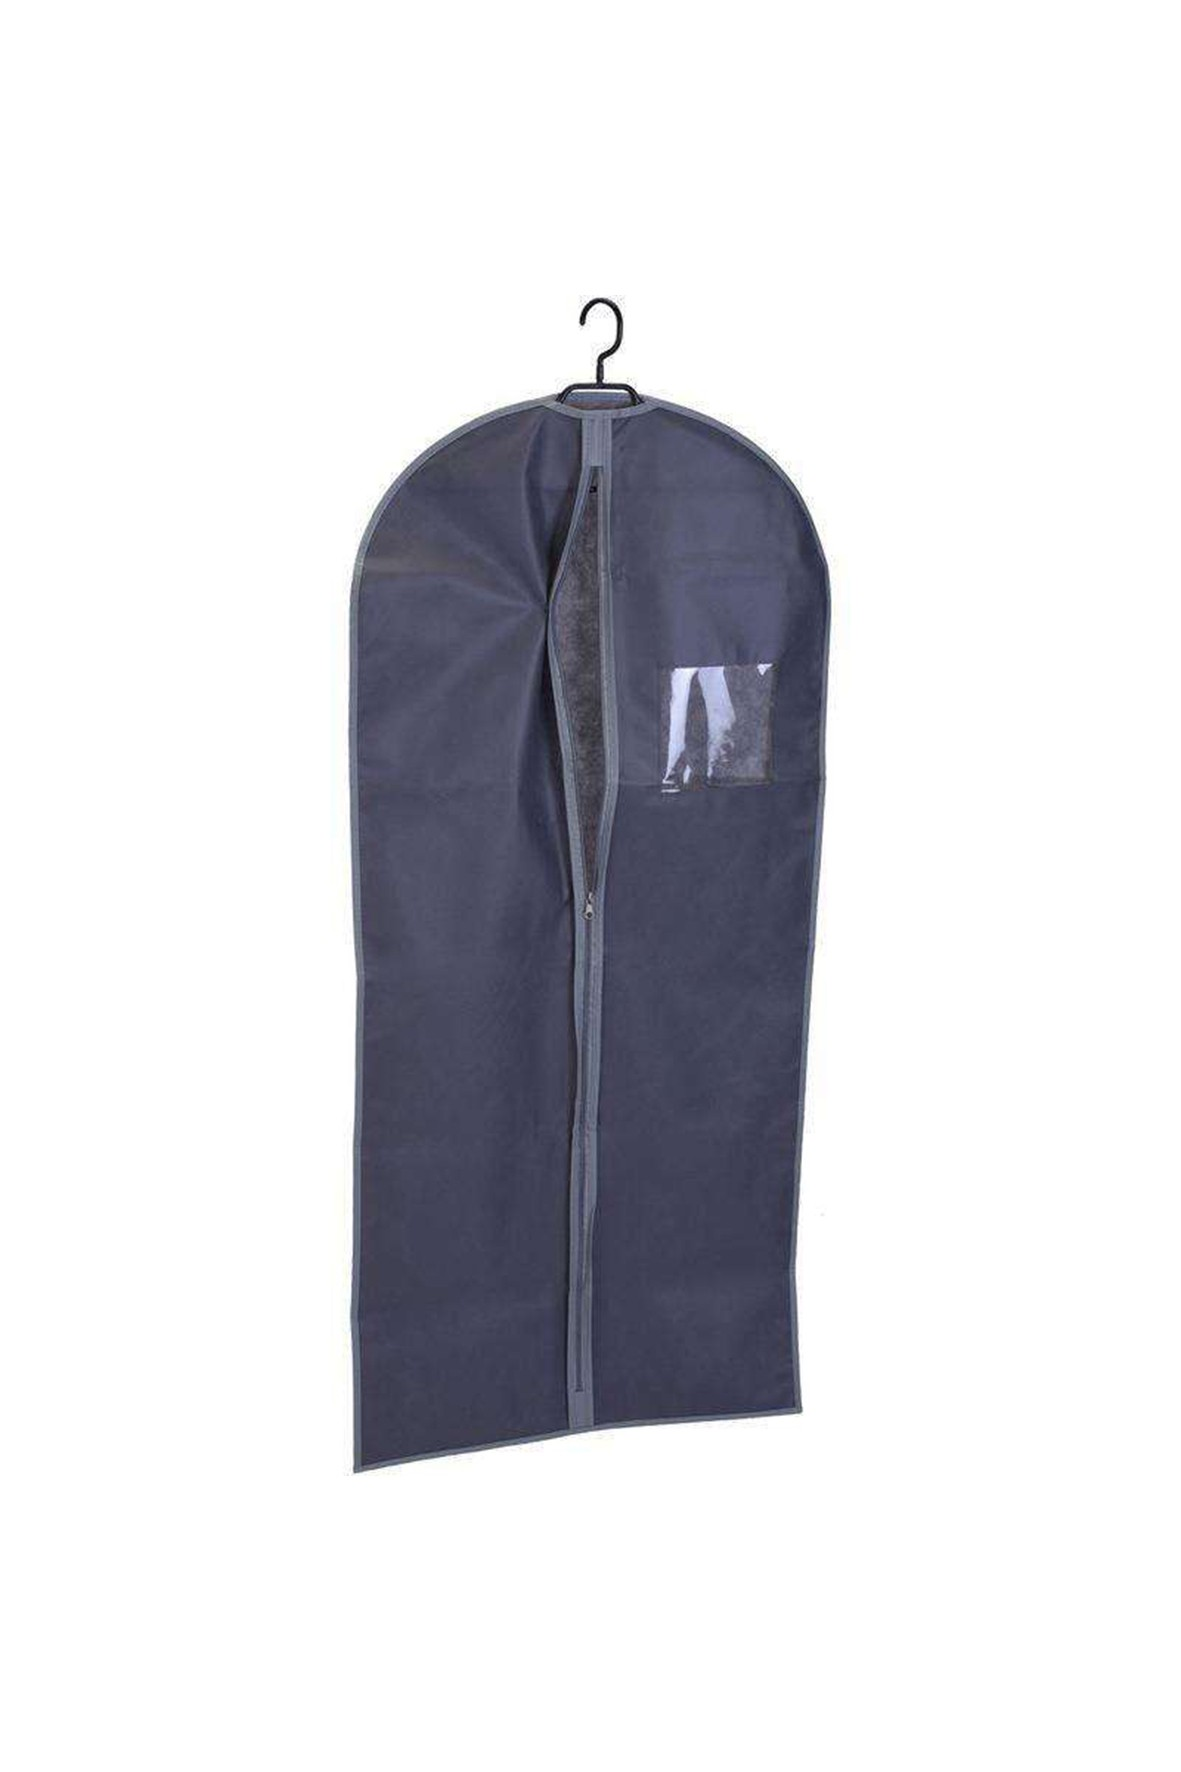 Pokrowiec na ubrania, garnitur, sukienkę 135x60cm